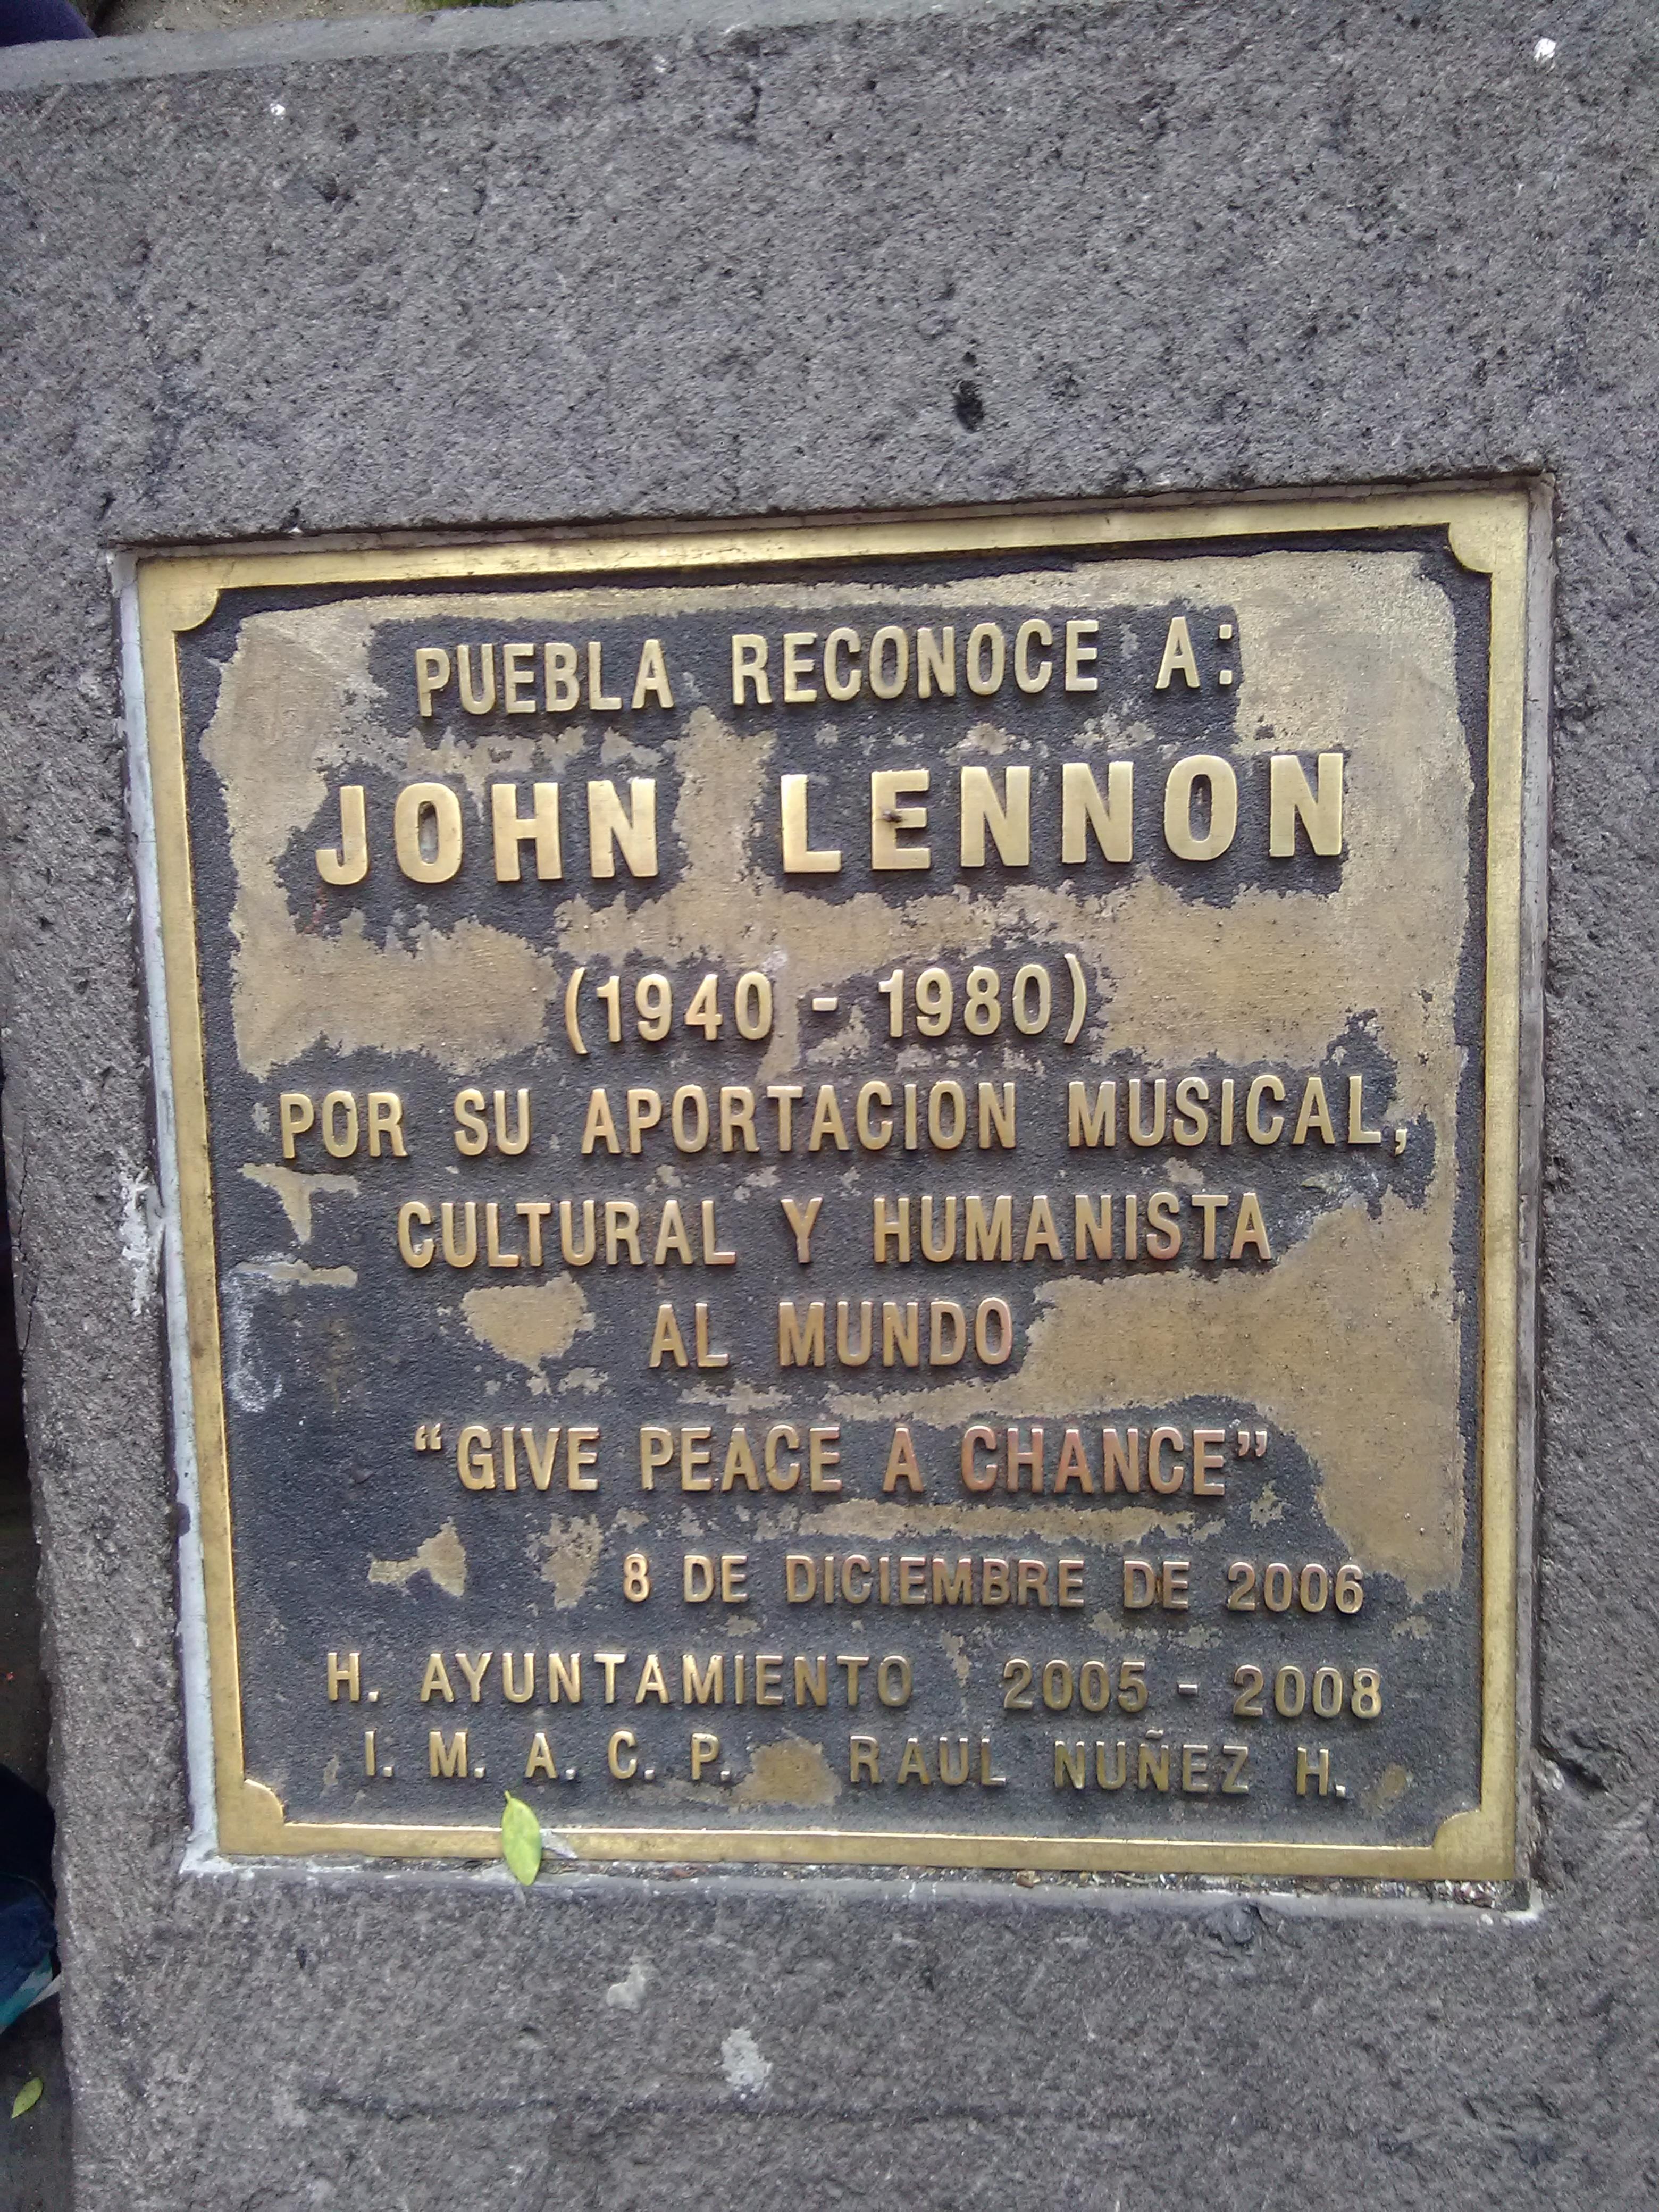 Placa conmemorativa en la Plaza de John Lennon, Puebla